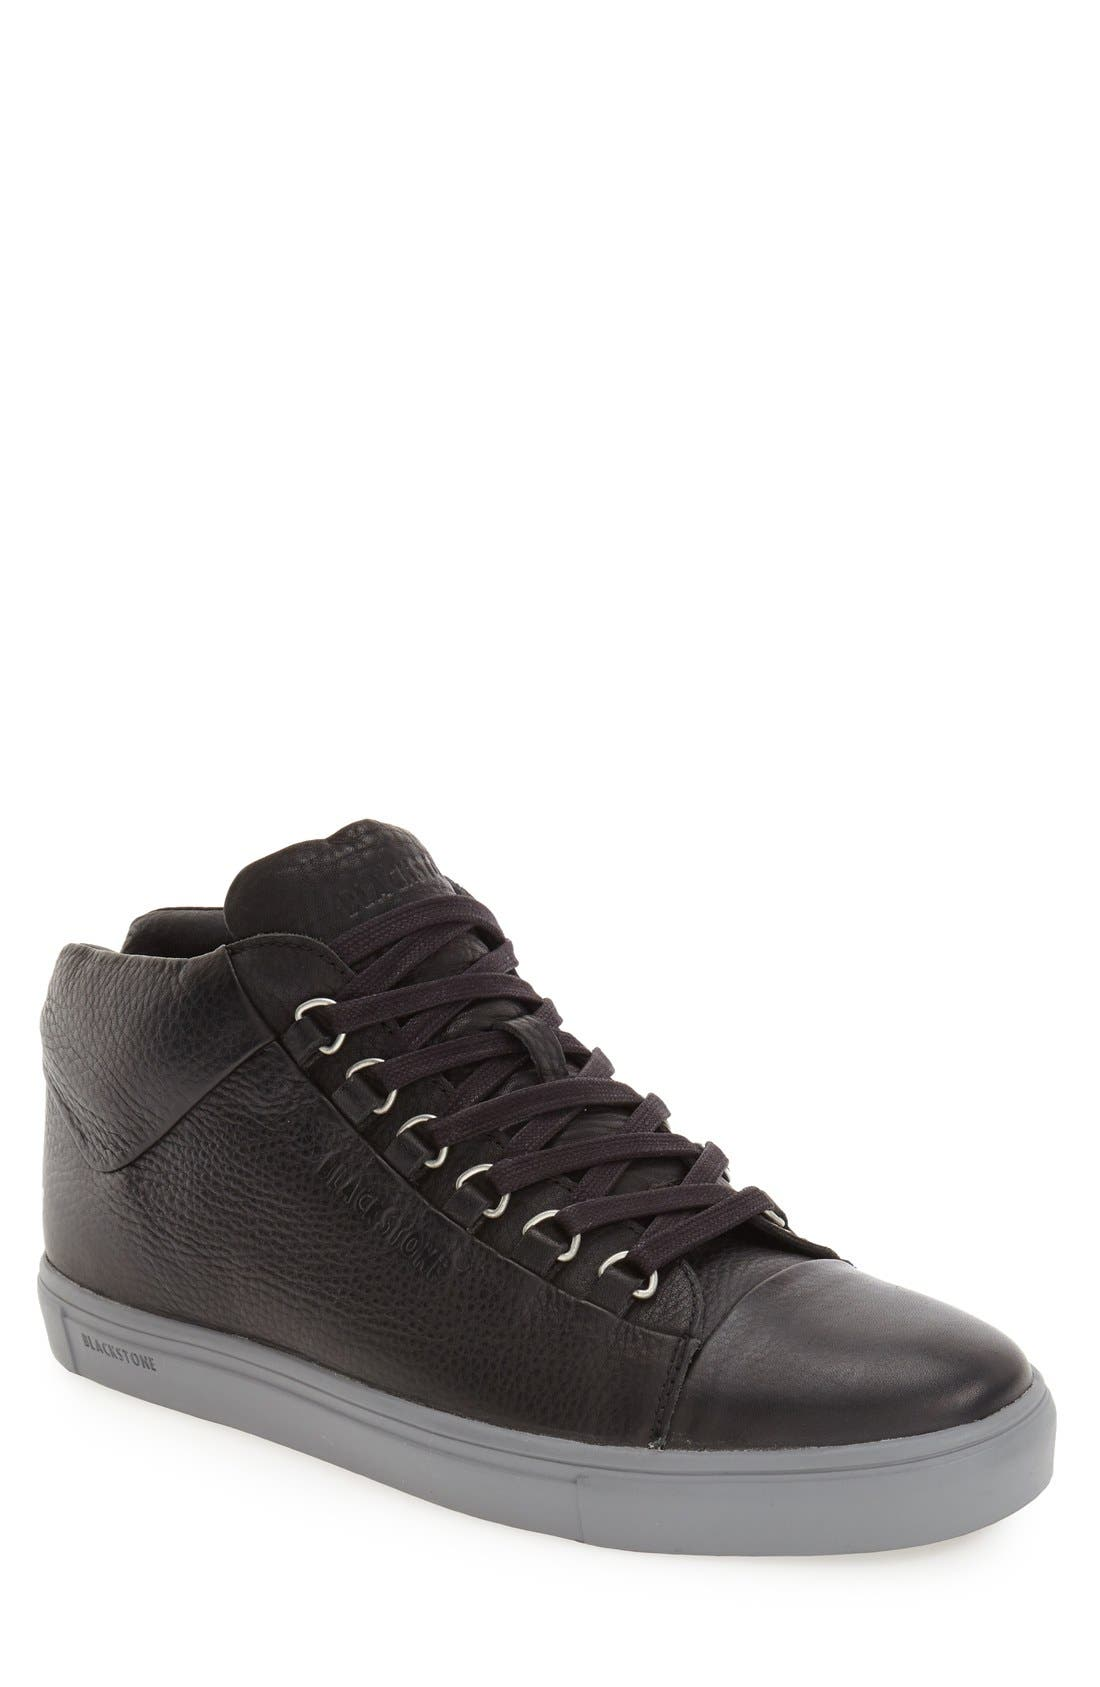 BLACKSTONE KM20 Sneaker